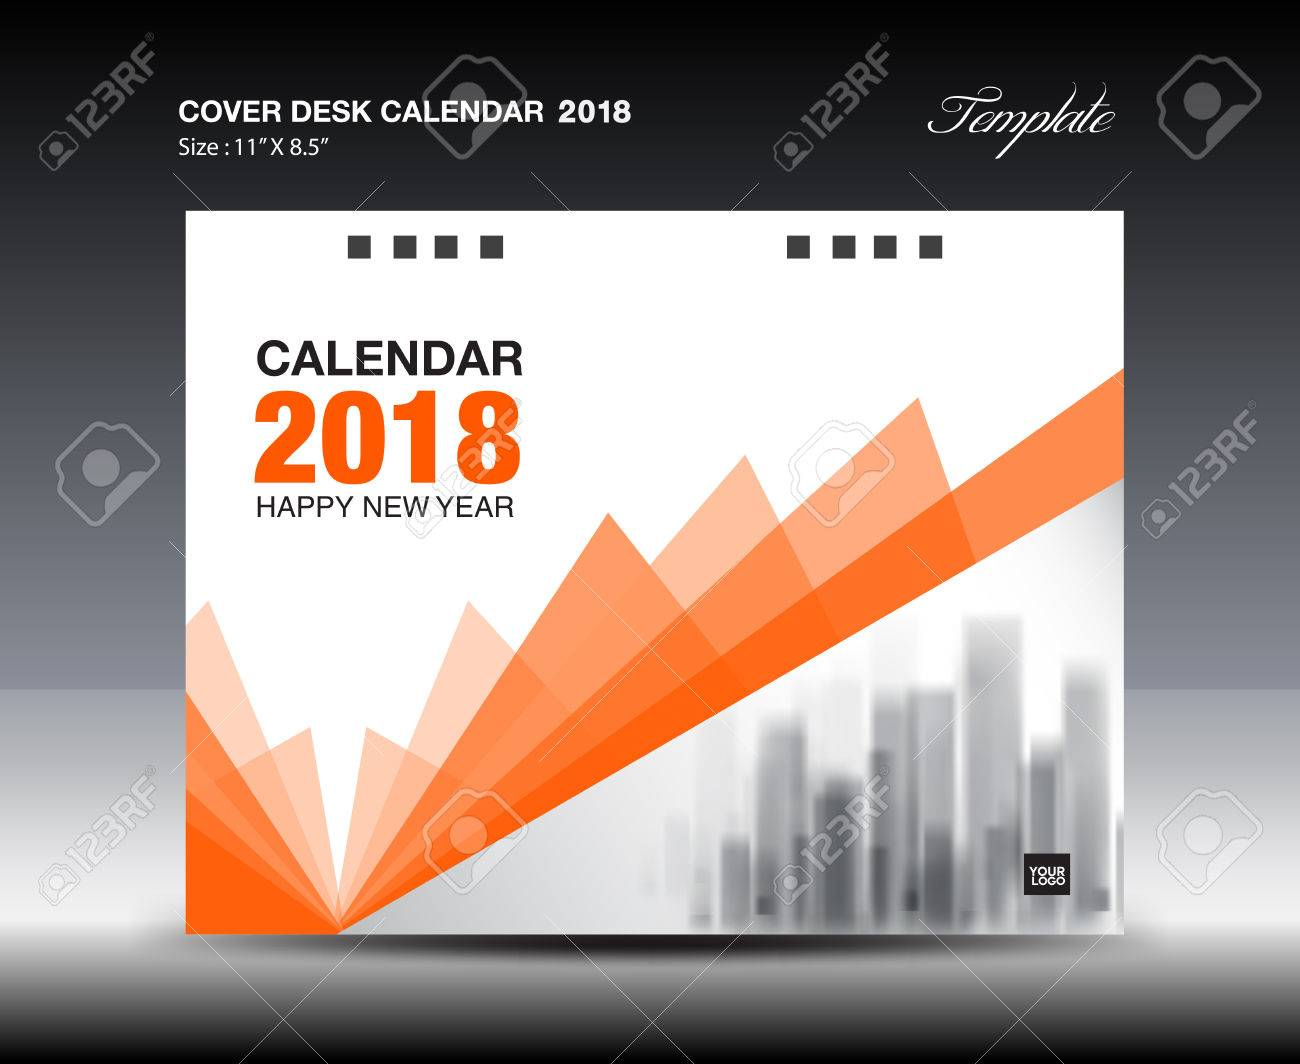 Desk Calendar Design Templates Ukrandiffusion